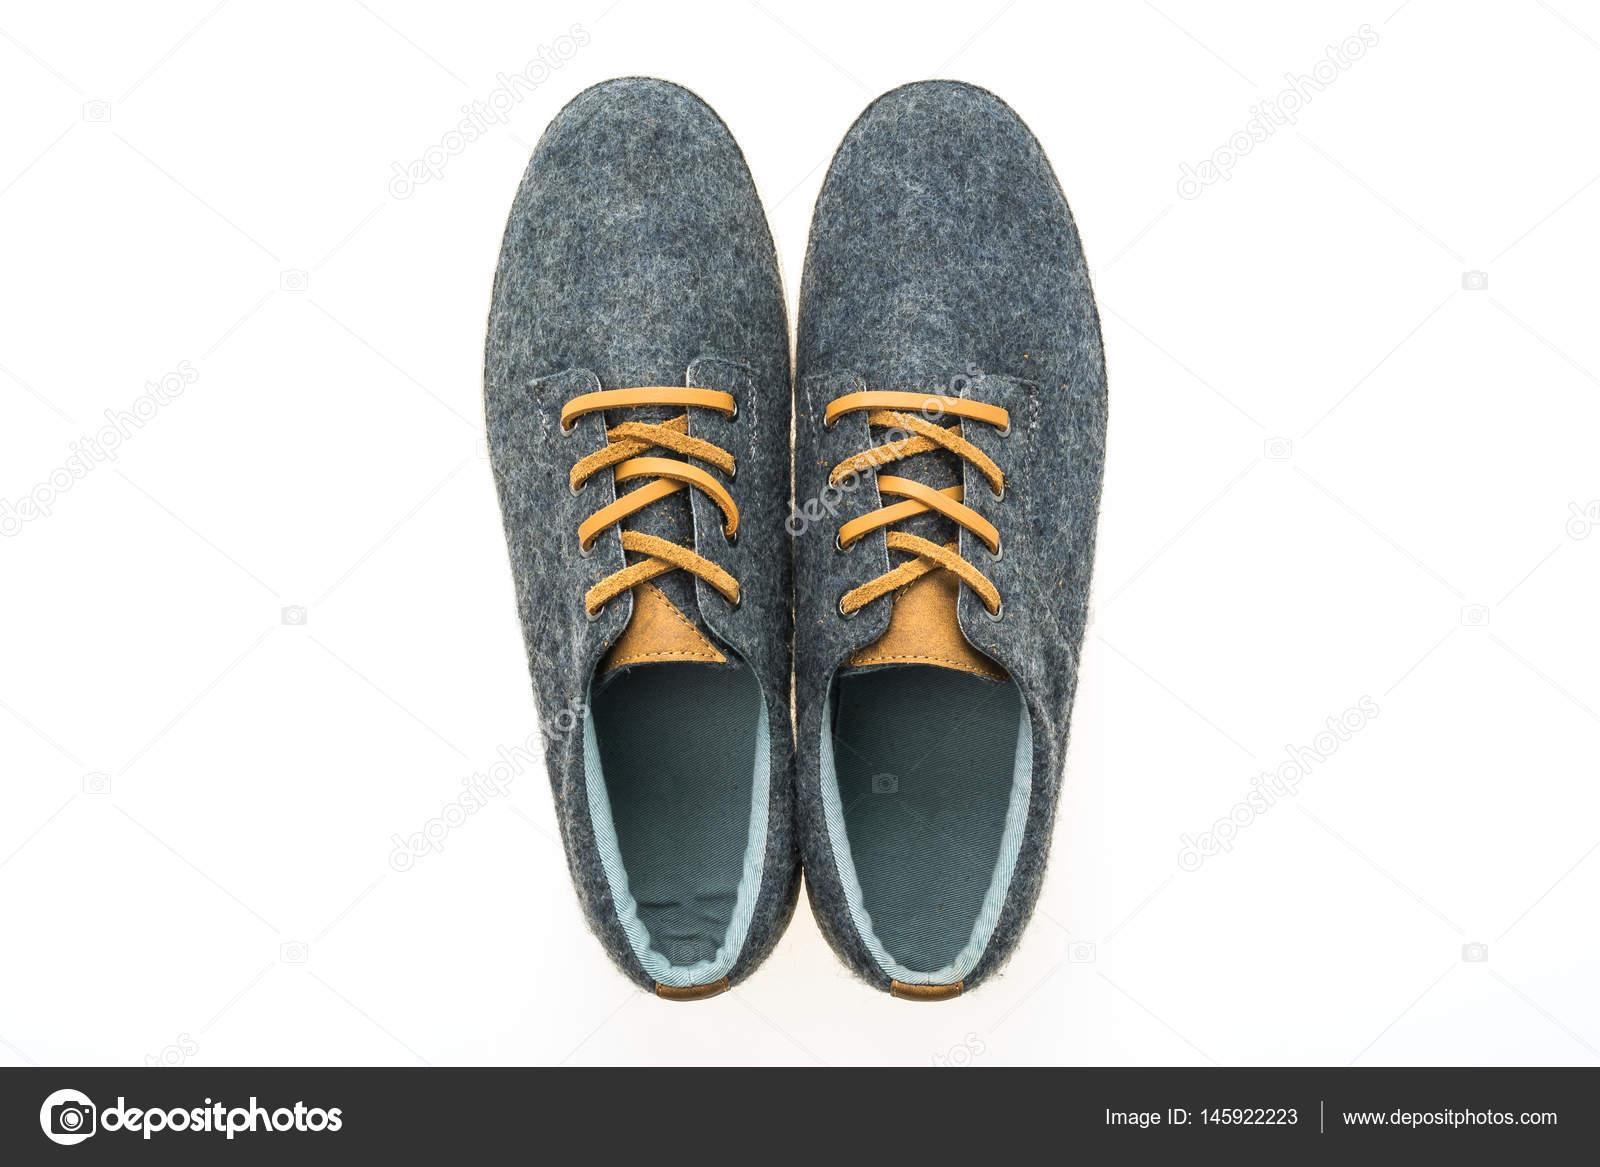 82ad0be1150 Αρσενικό παπούτσια μόδας που απομονώνονται σε λευκό φόντο — Εικόνα από  mrsiraphol